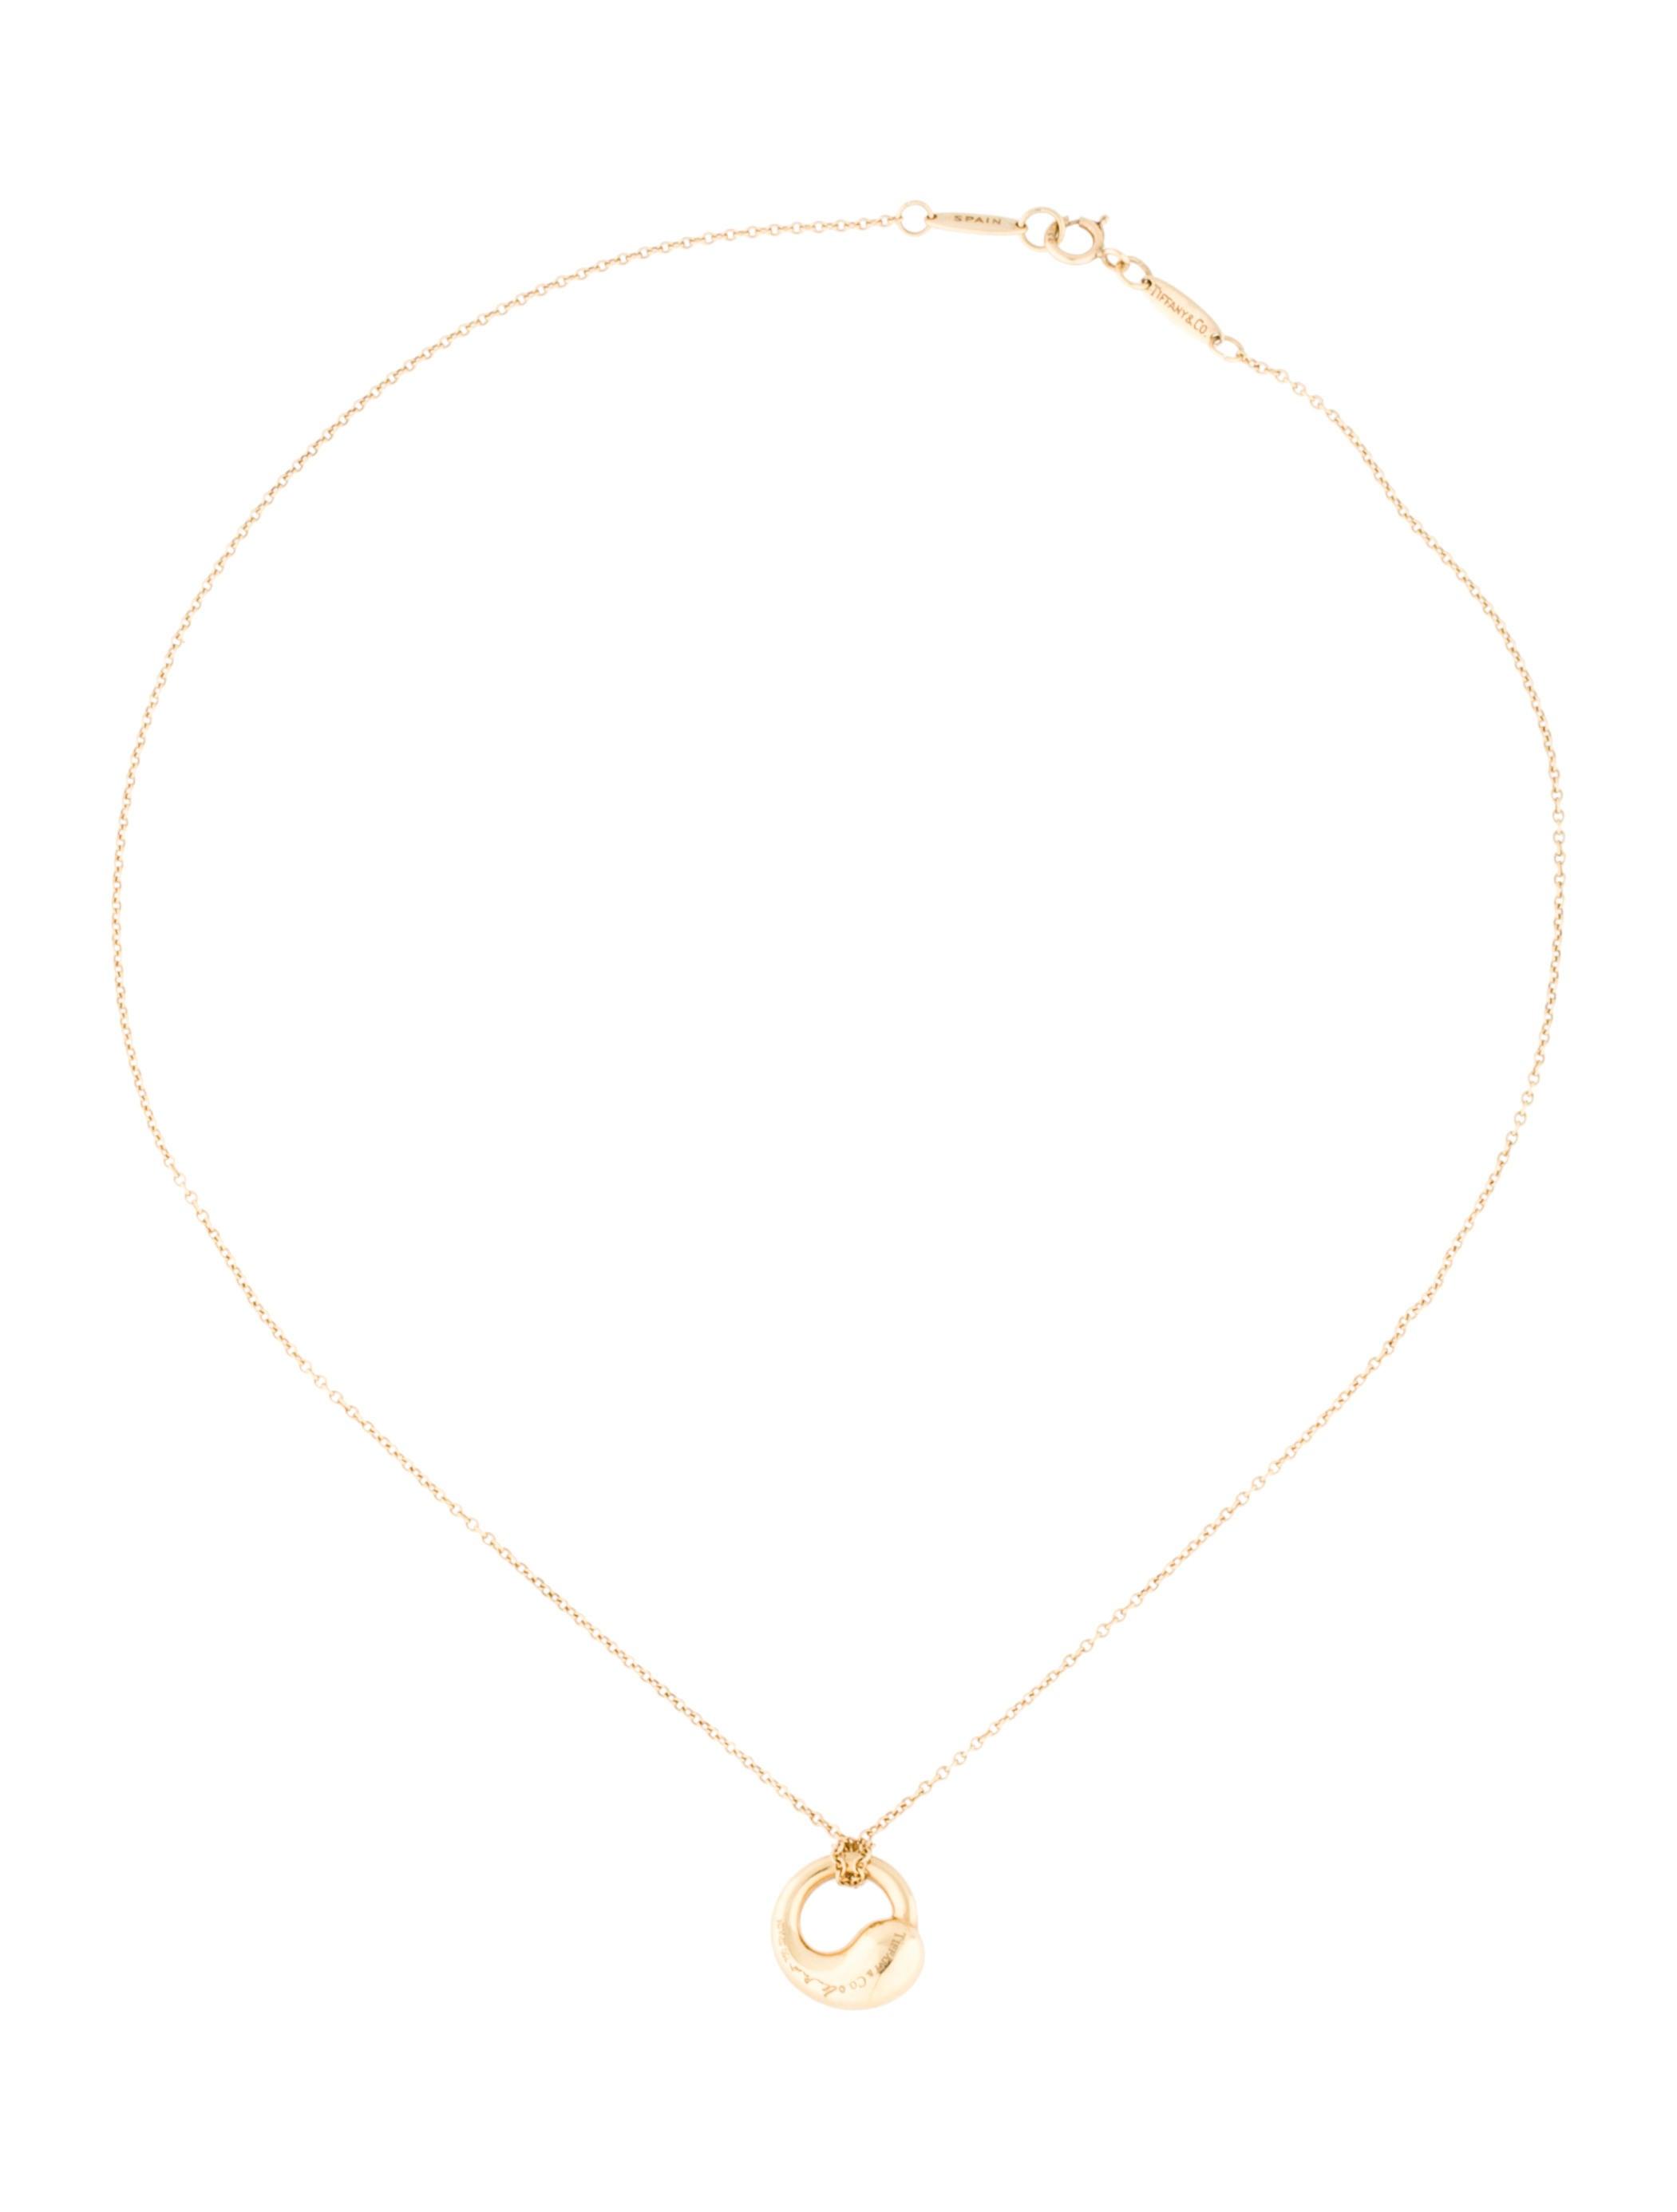 Tiffany co elsa peretti eternal circle pendant necklace elsa peretti eternal circle pendant necklace aloadofball Images